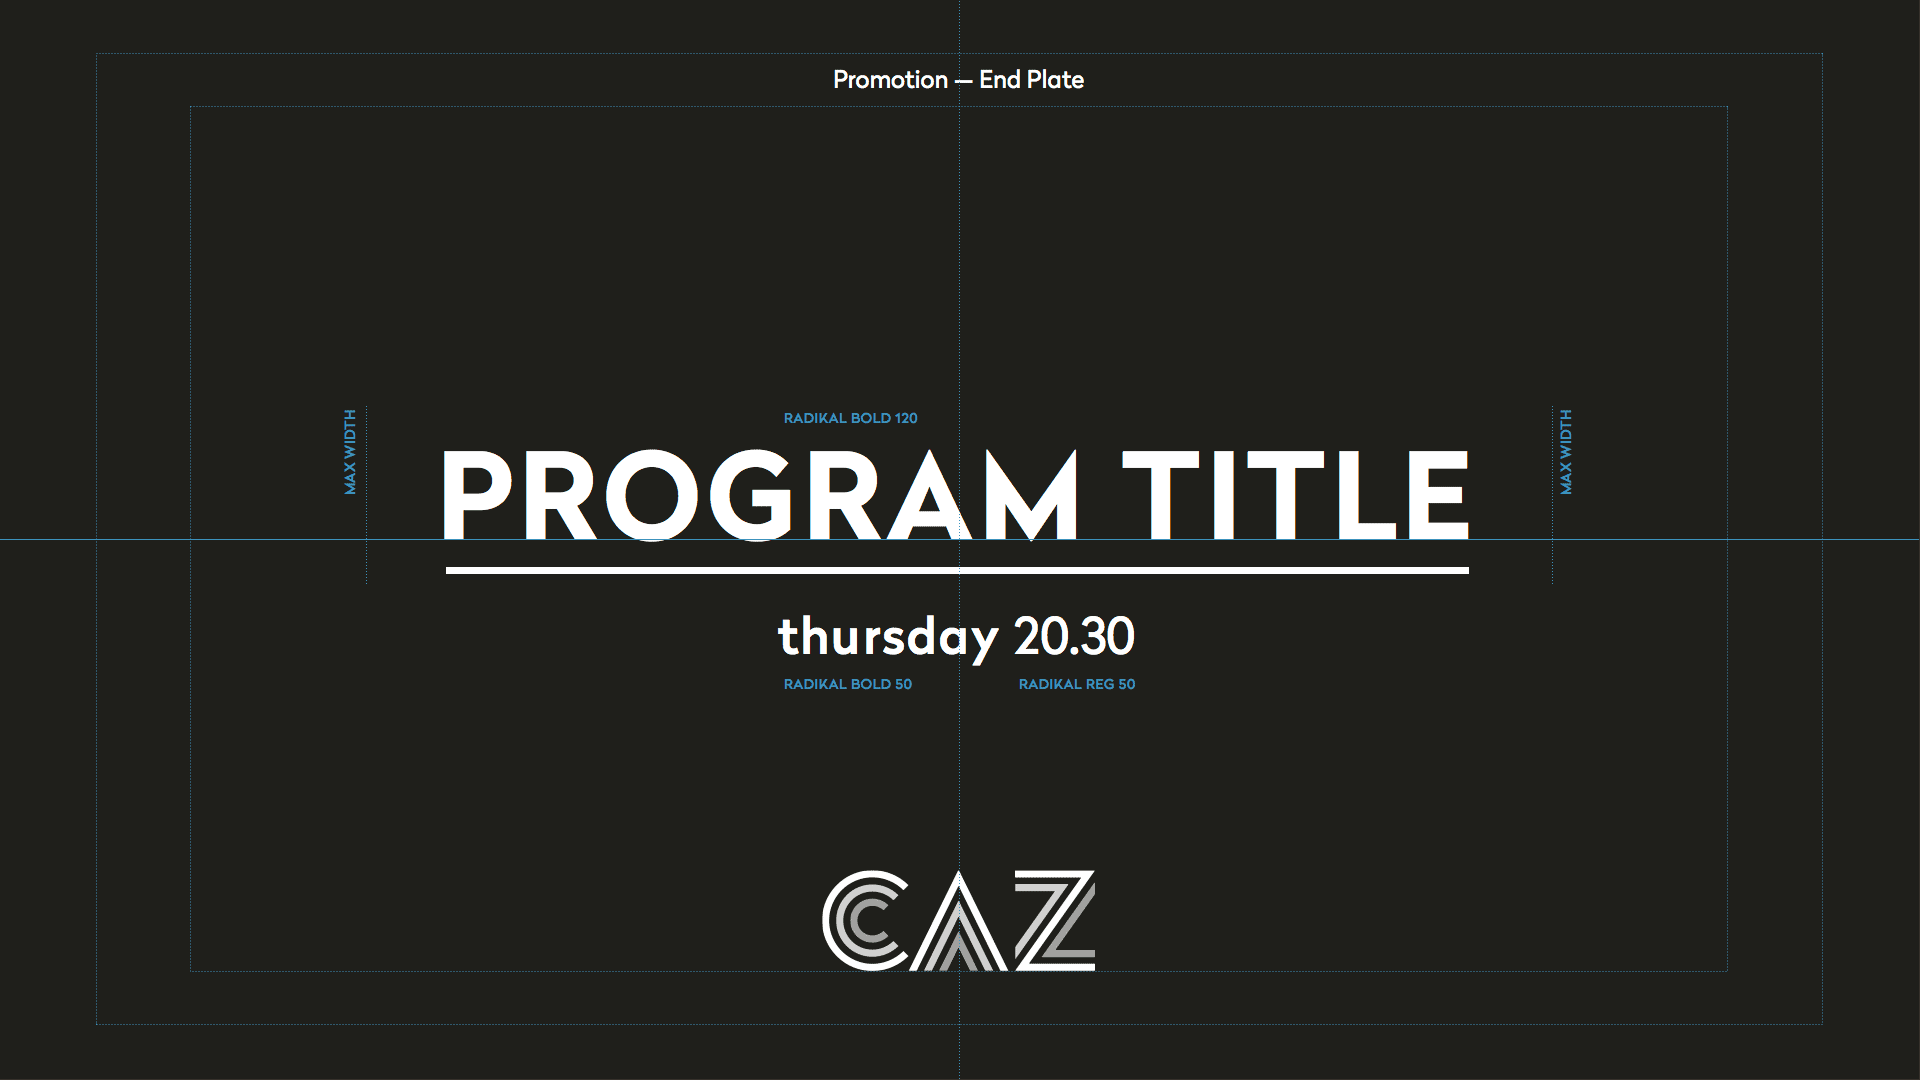 CAZ Promotion End Plate brand system